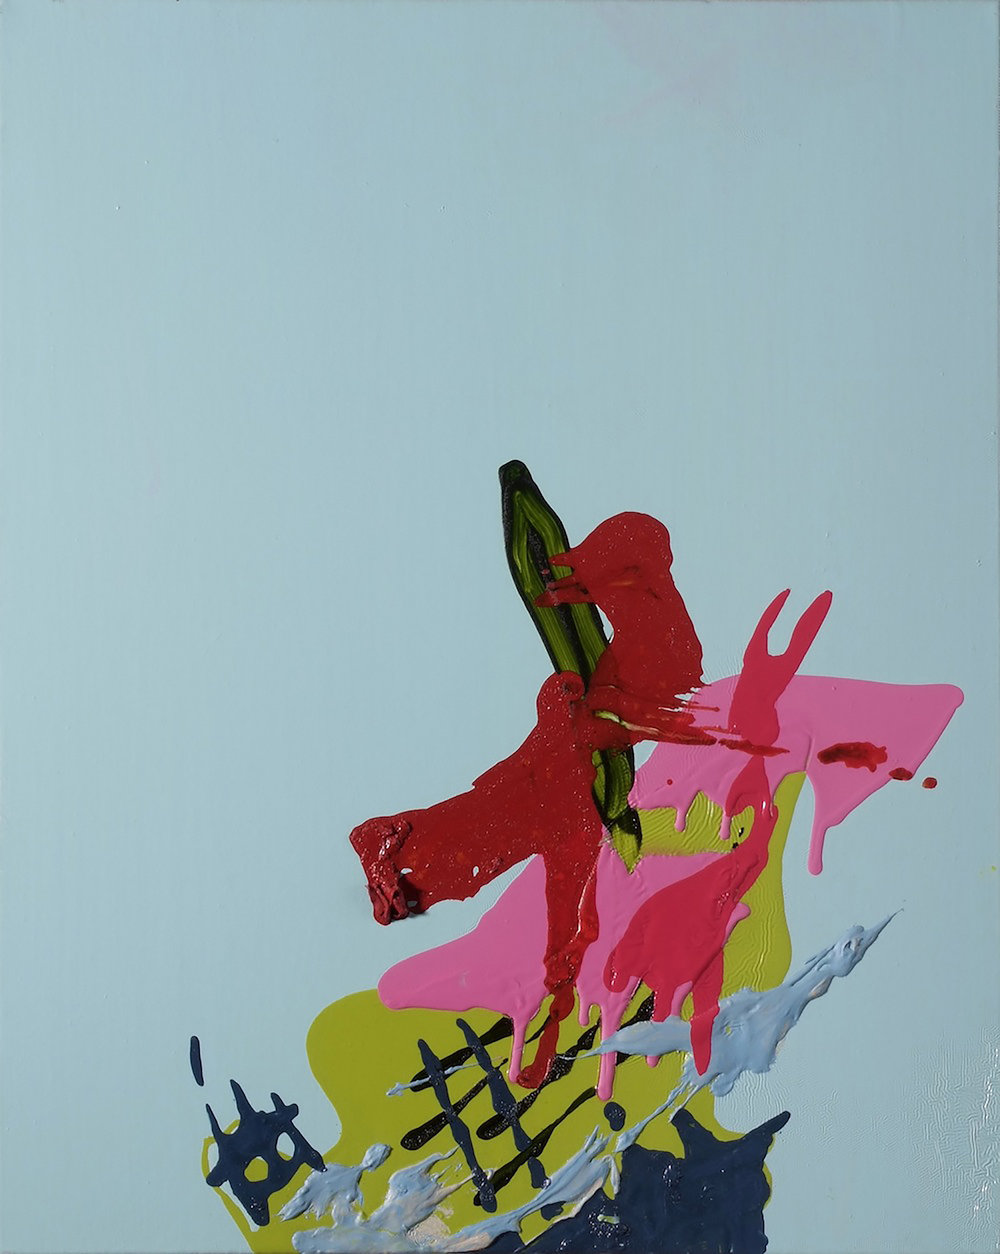 o.T. | 2008 | Öl und Acryl auf Leinwand | 50,5 x 41 cm